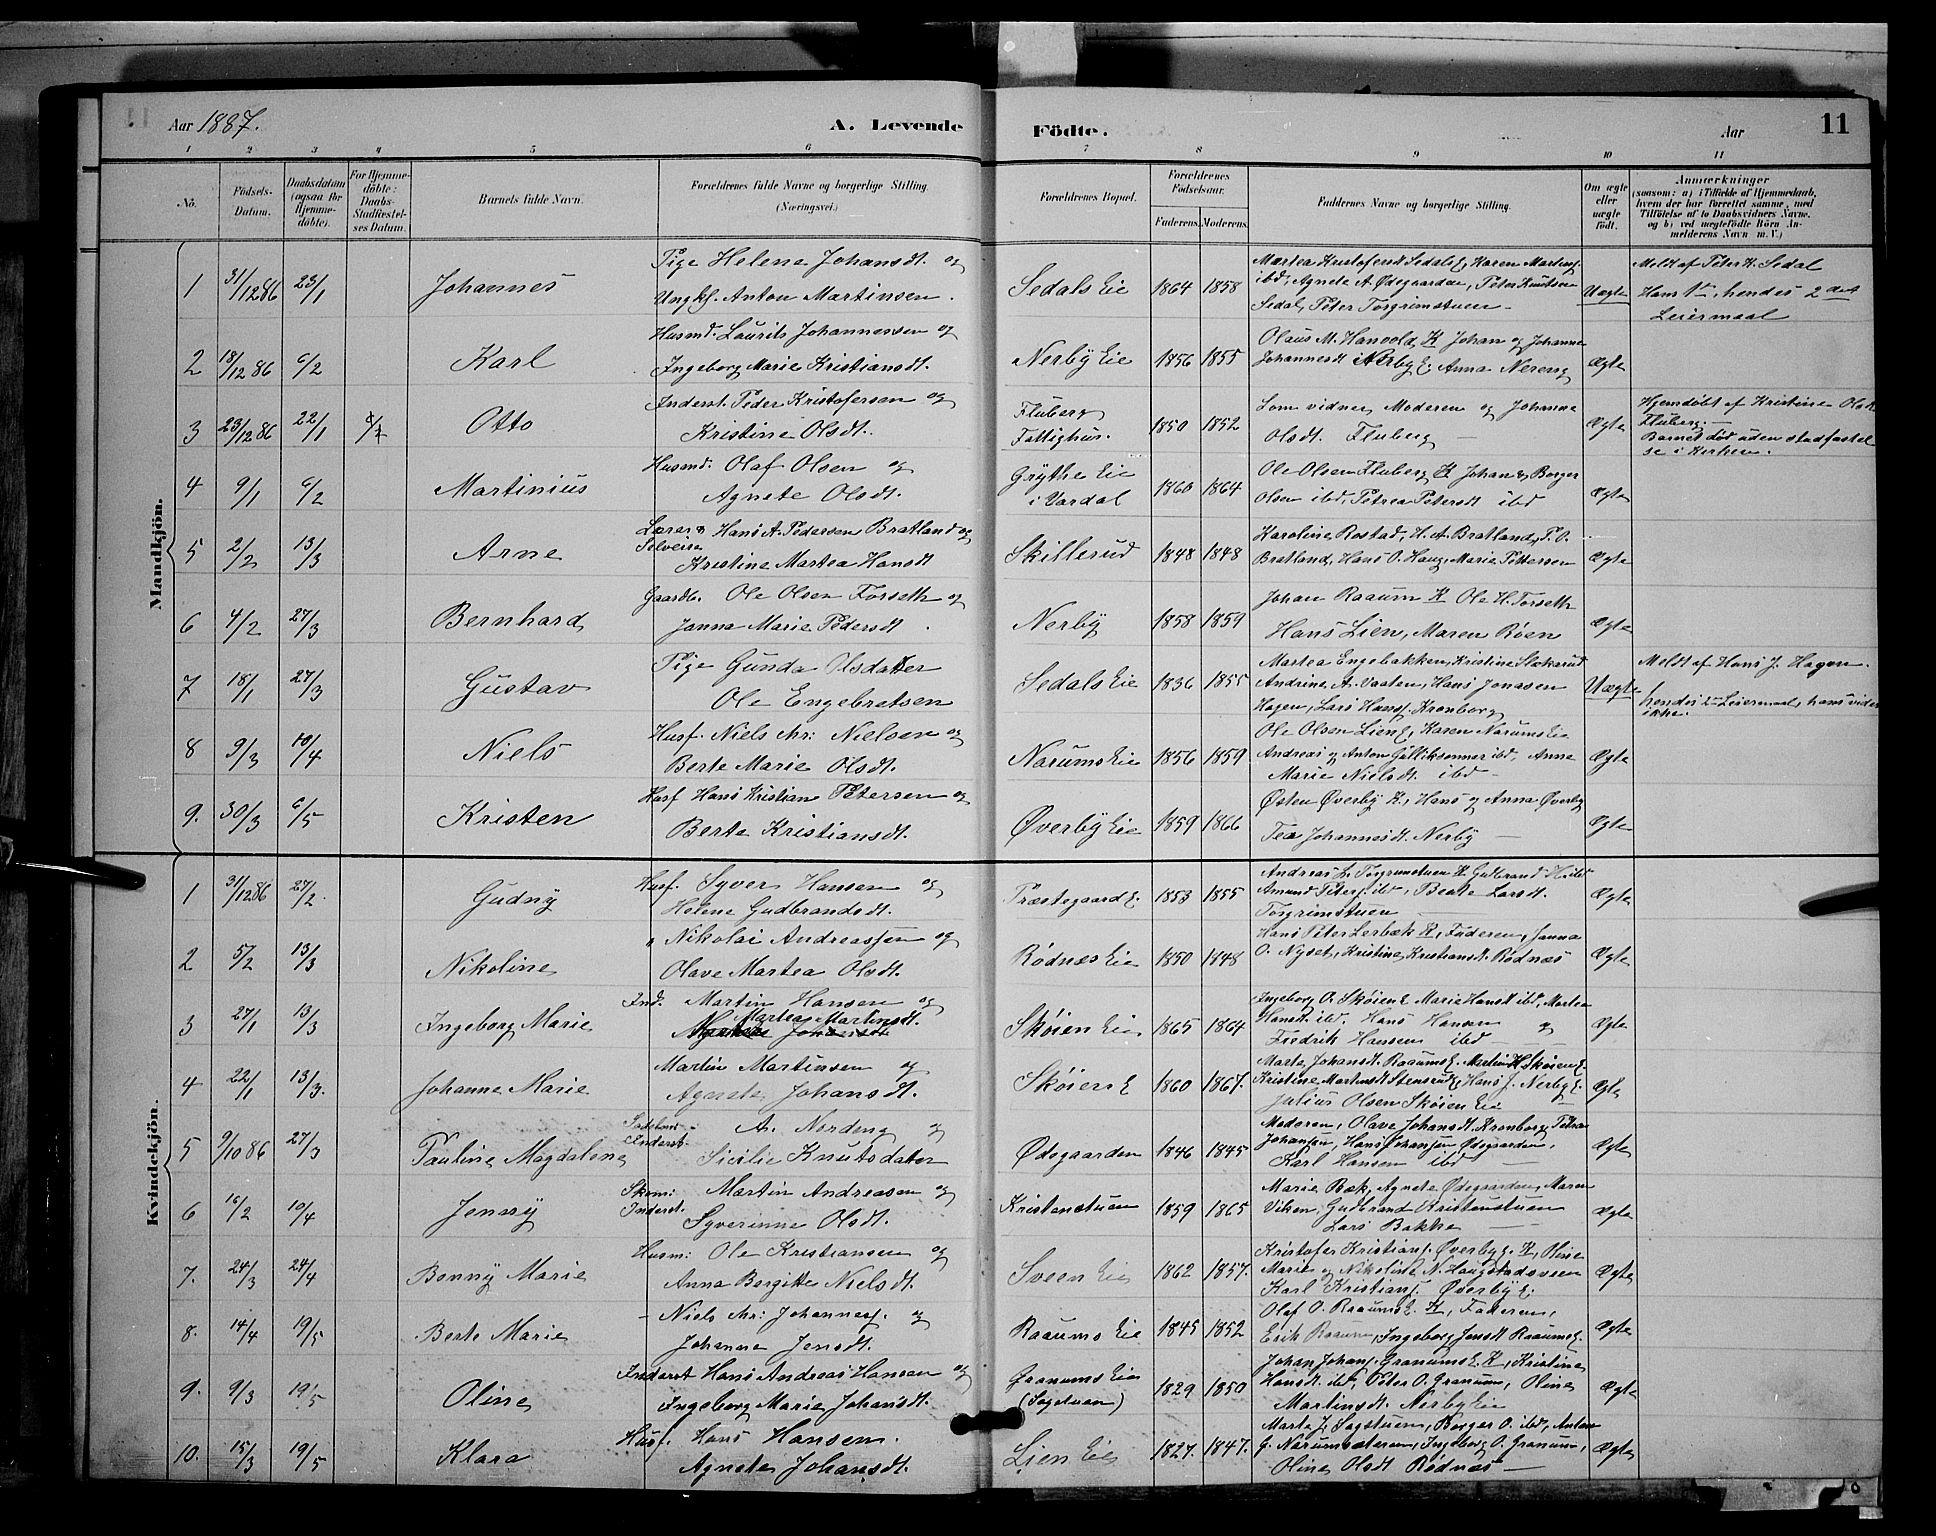 SAH, Søndre Land prestekontor, L/L0003: Klokkerbok nr. 3, 1884-1902, s. 11